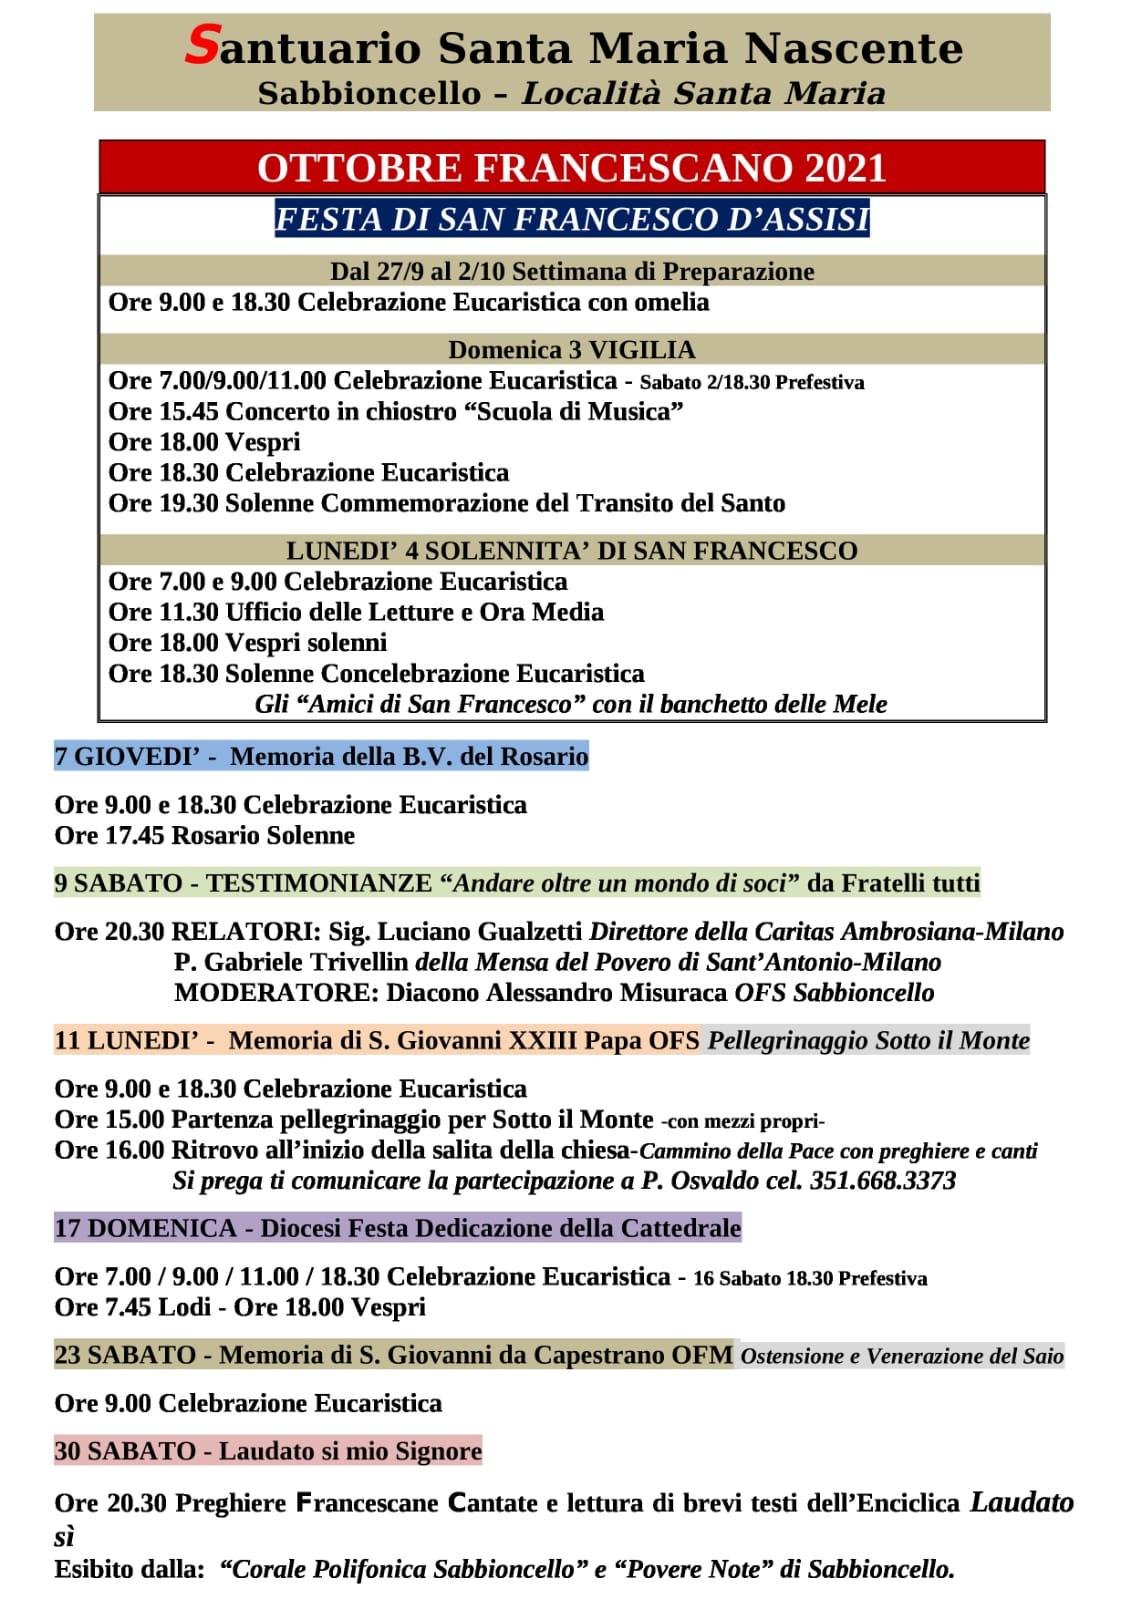 Ottobre Francescano – Programma. Santuario Francescano Di Sabbioncello